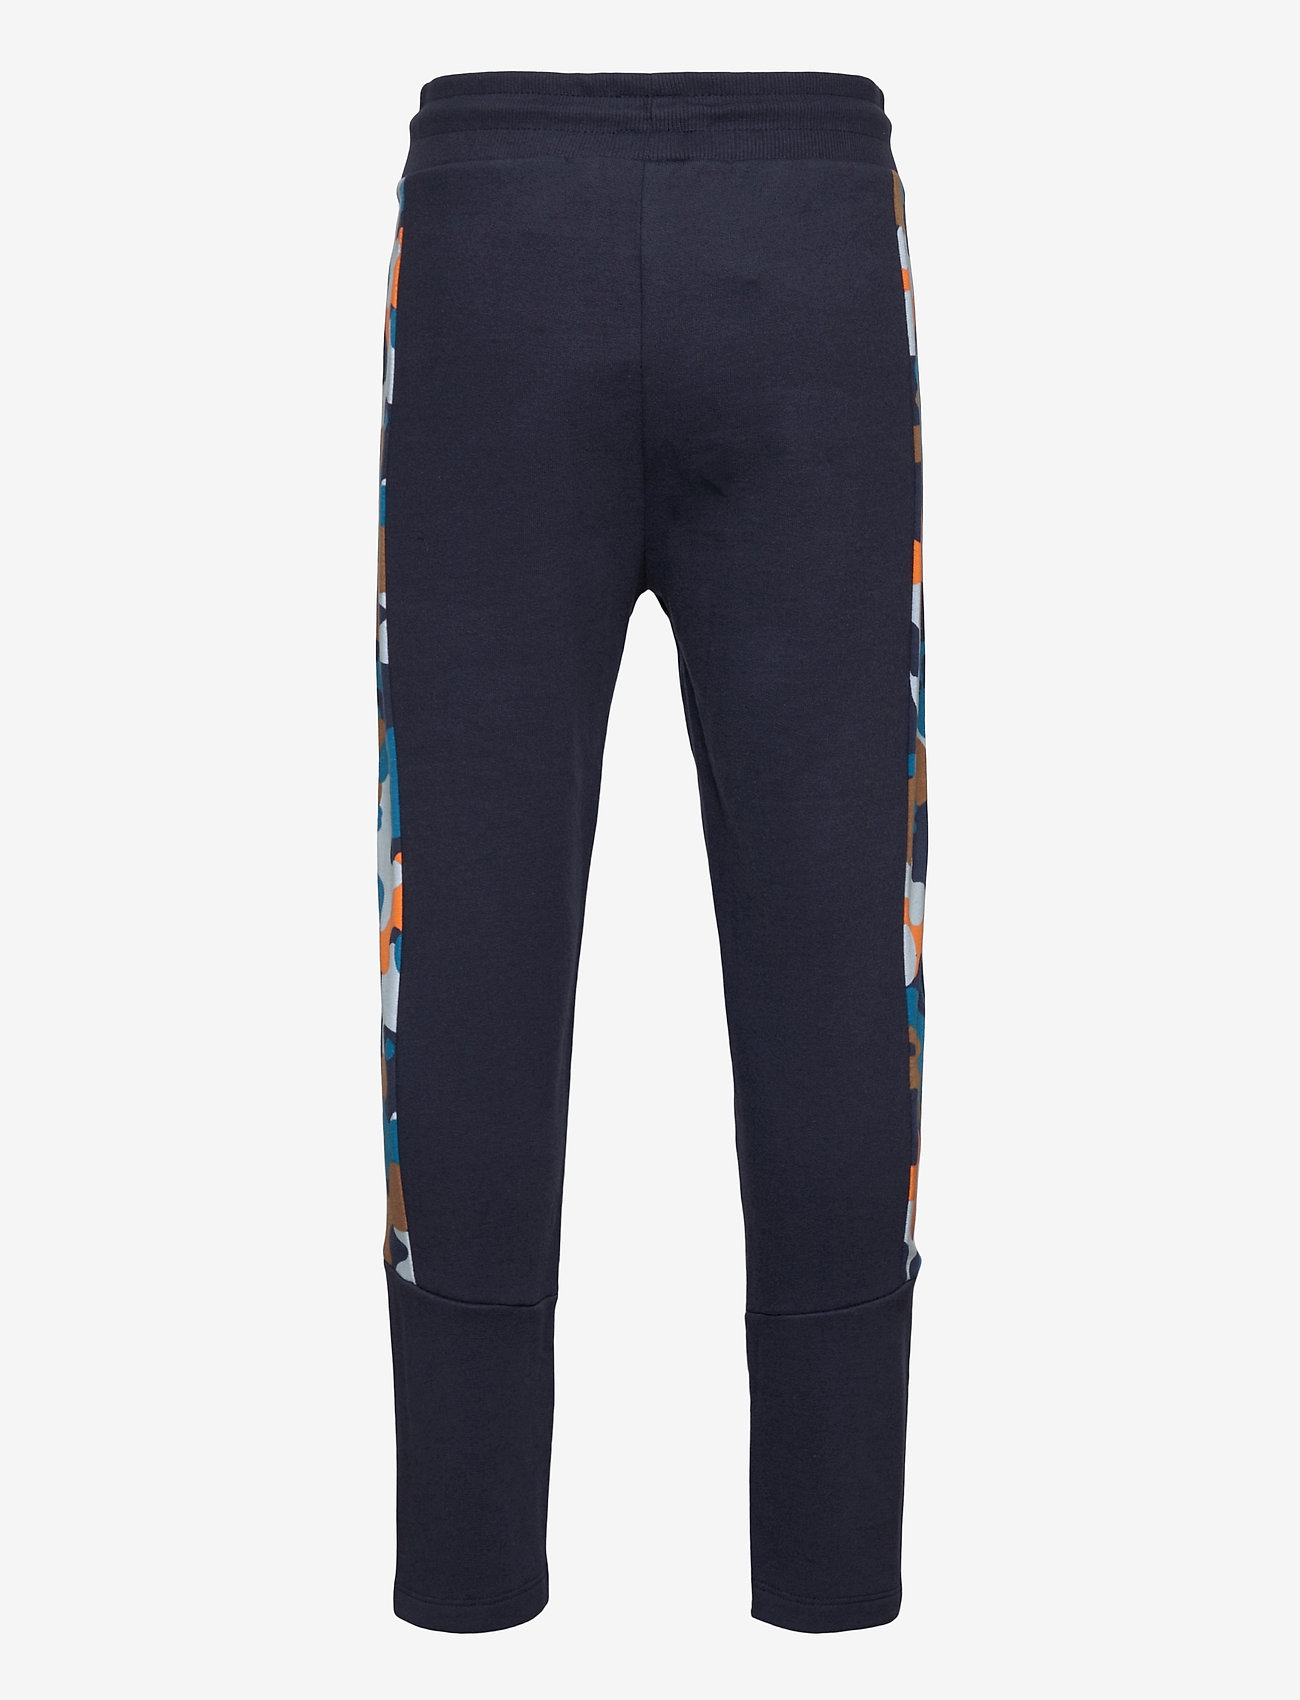 Hummel - hmlRACE PANTS - sweatpants - black iris - 1